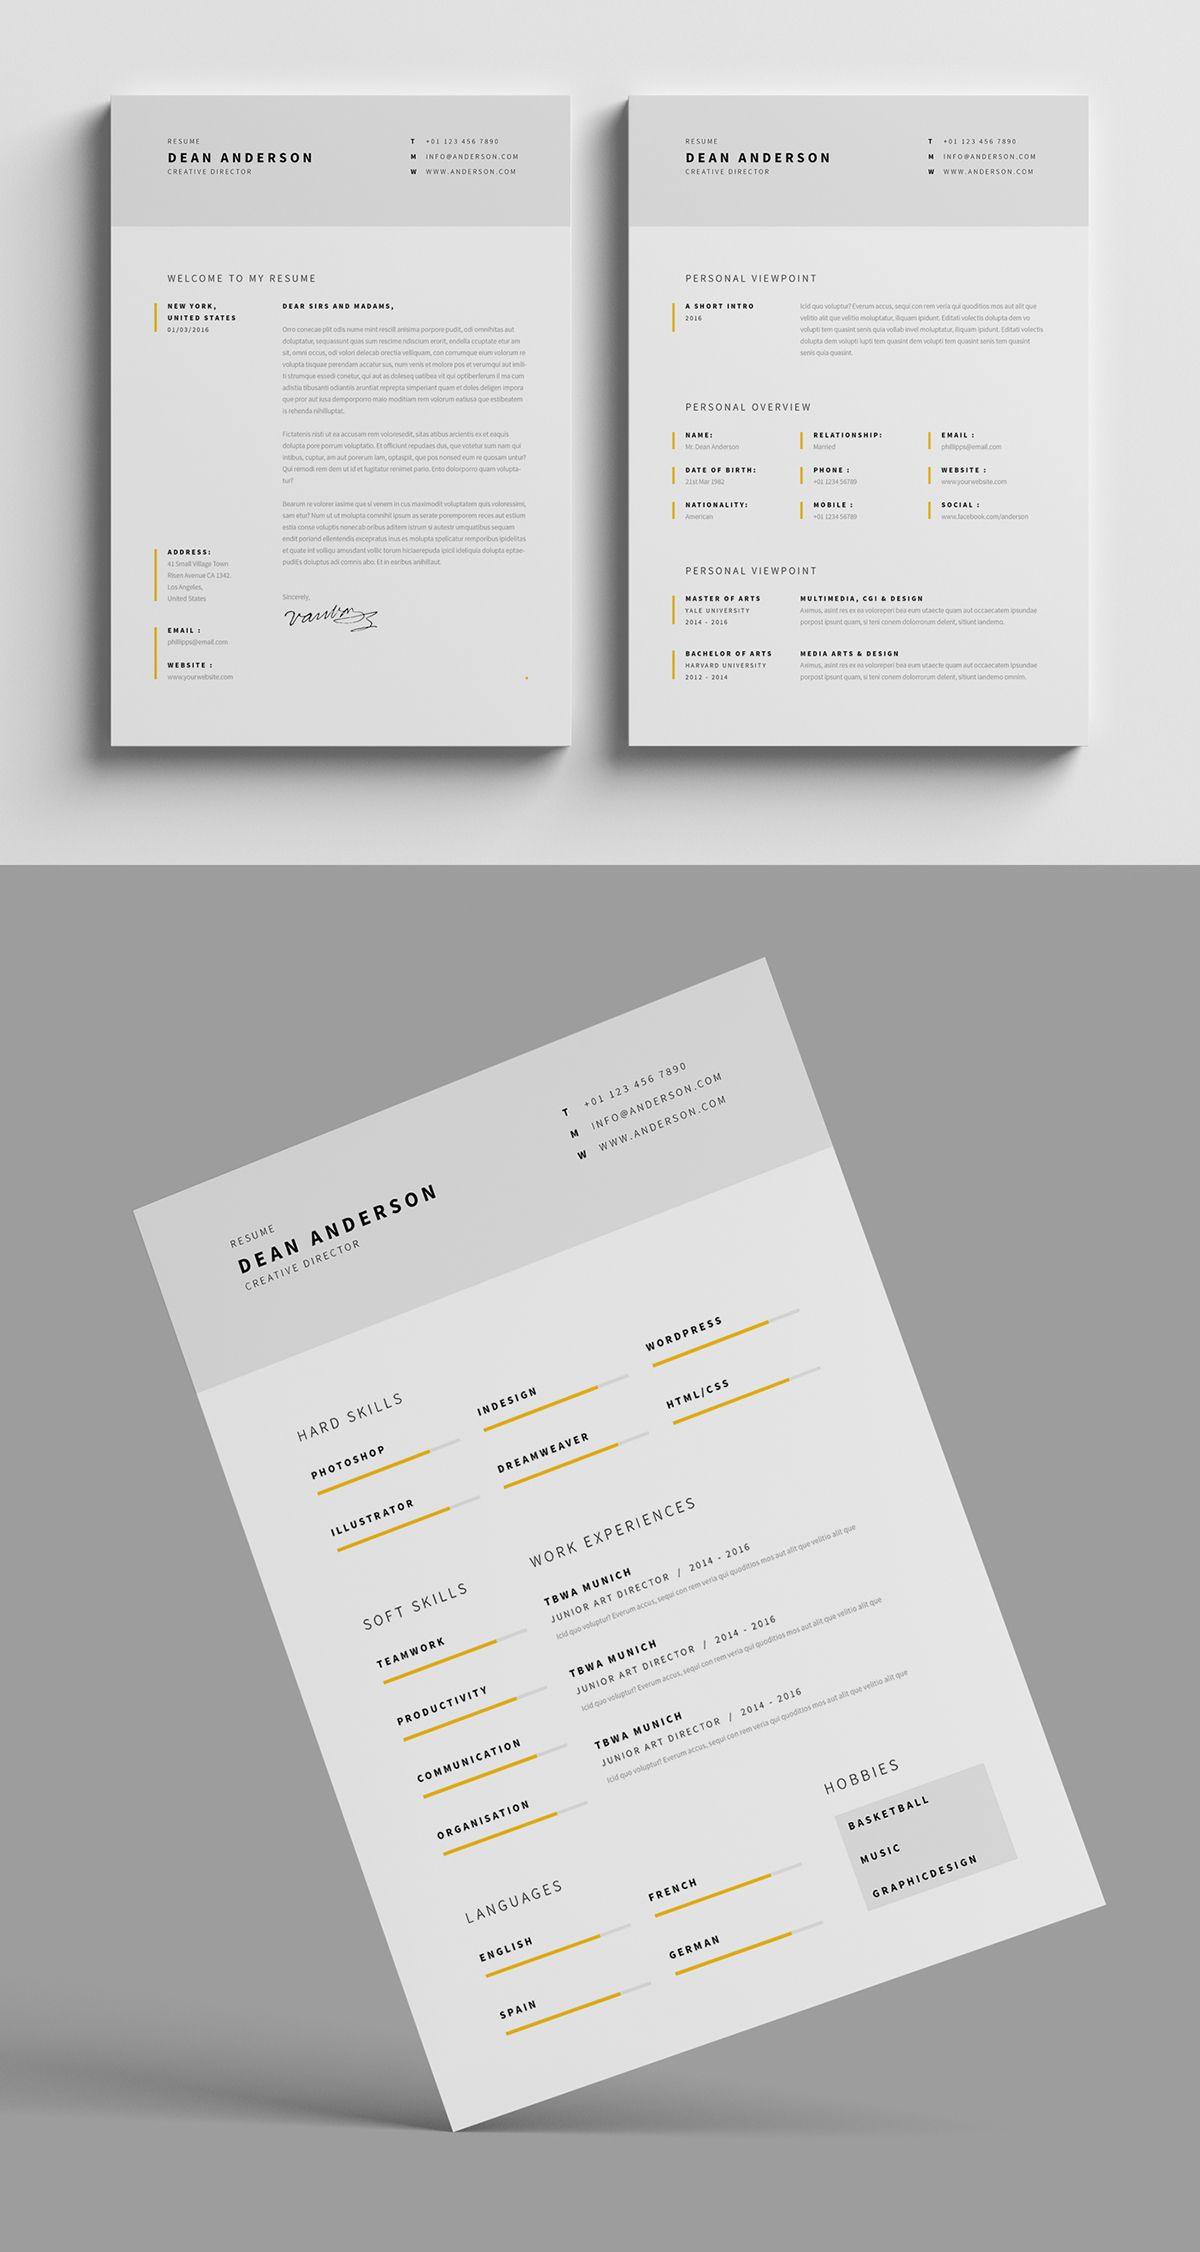 resume    cv    portfolio u201cresume    cv u201d is the super clean